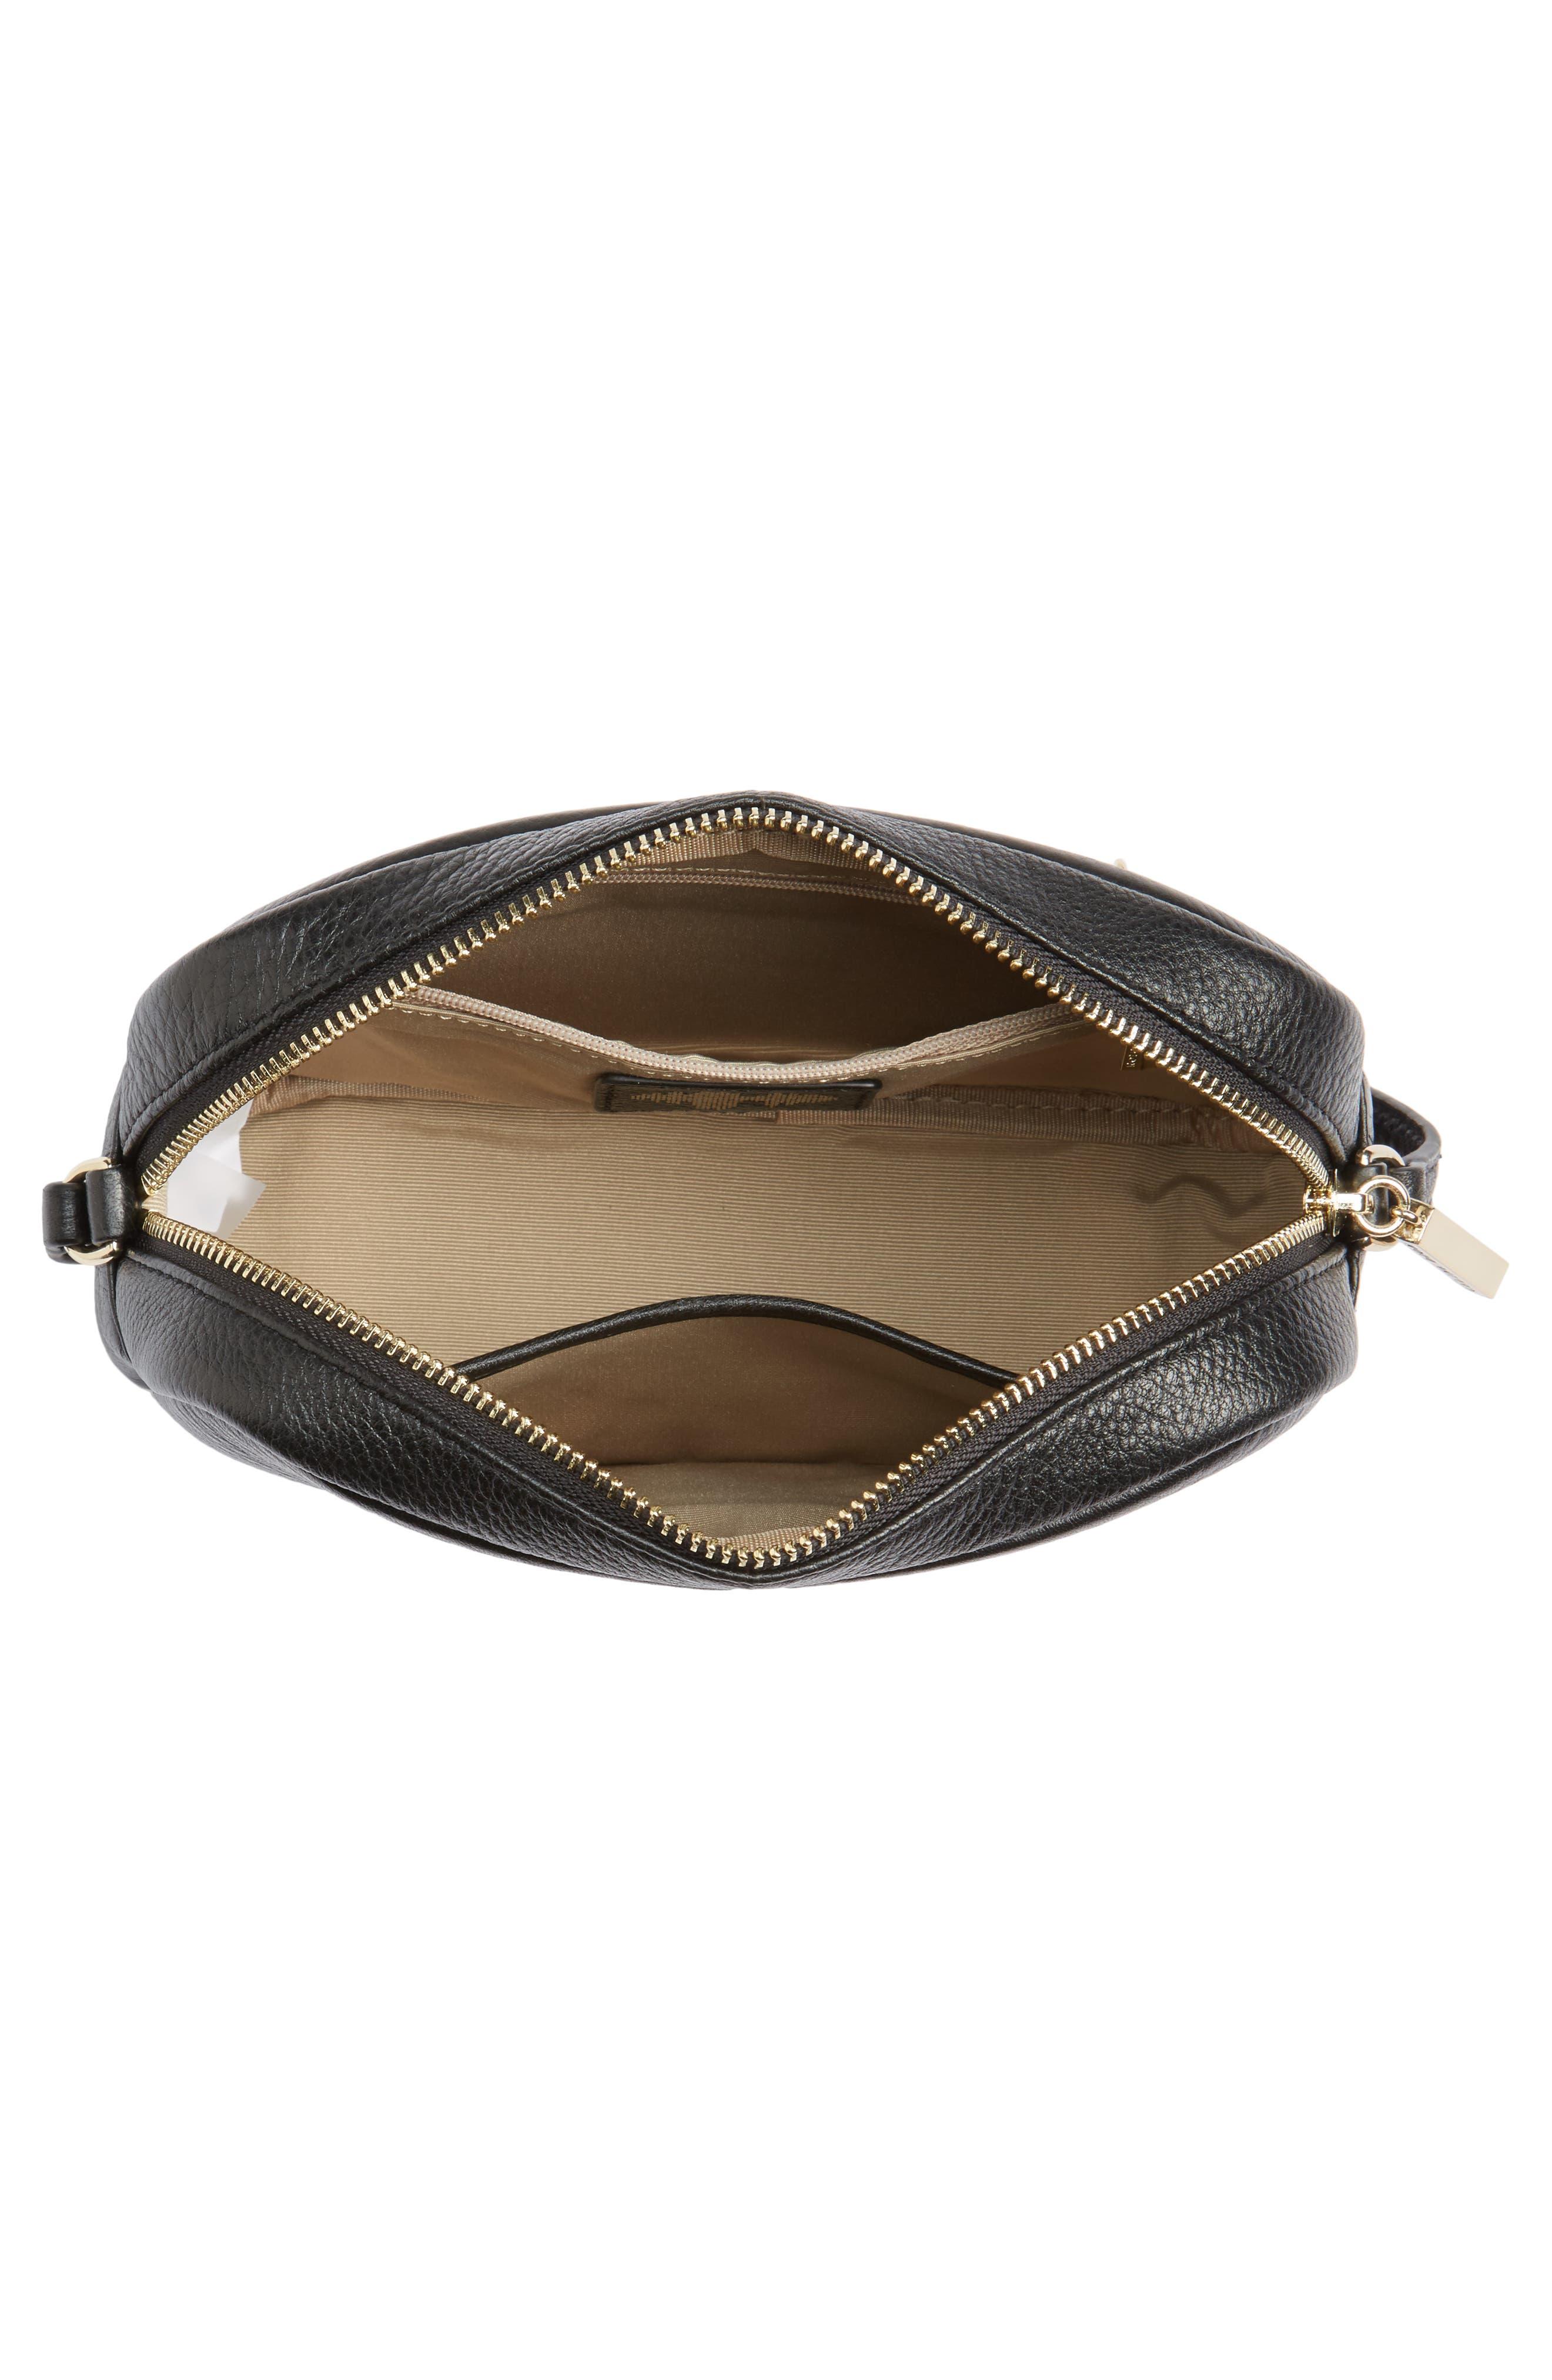 Céline Dion Adagio Leather Camera Crossbody Bag,                             Alternate thumbnail 4, color,                             Black